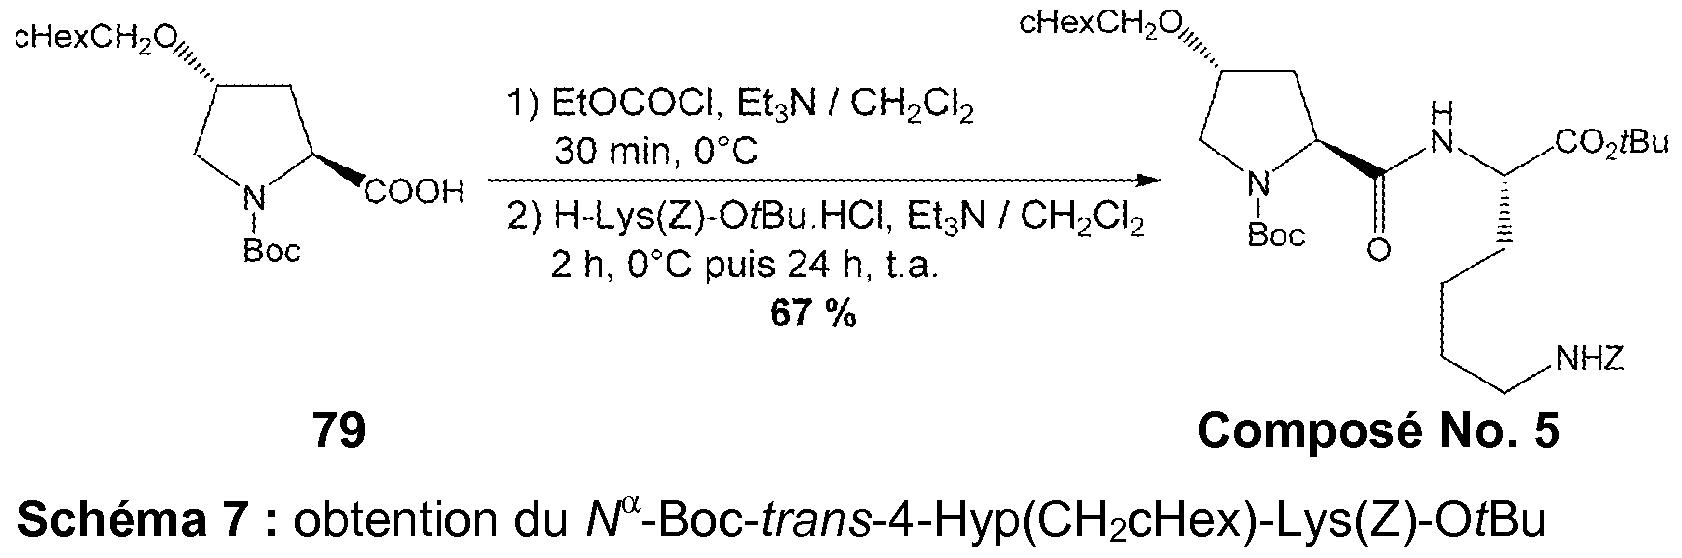 impurity profile pregabalin generic